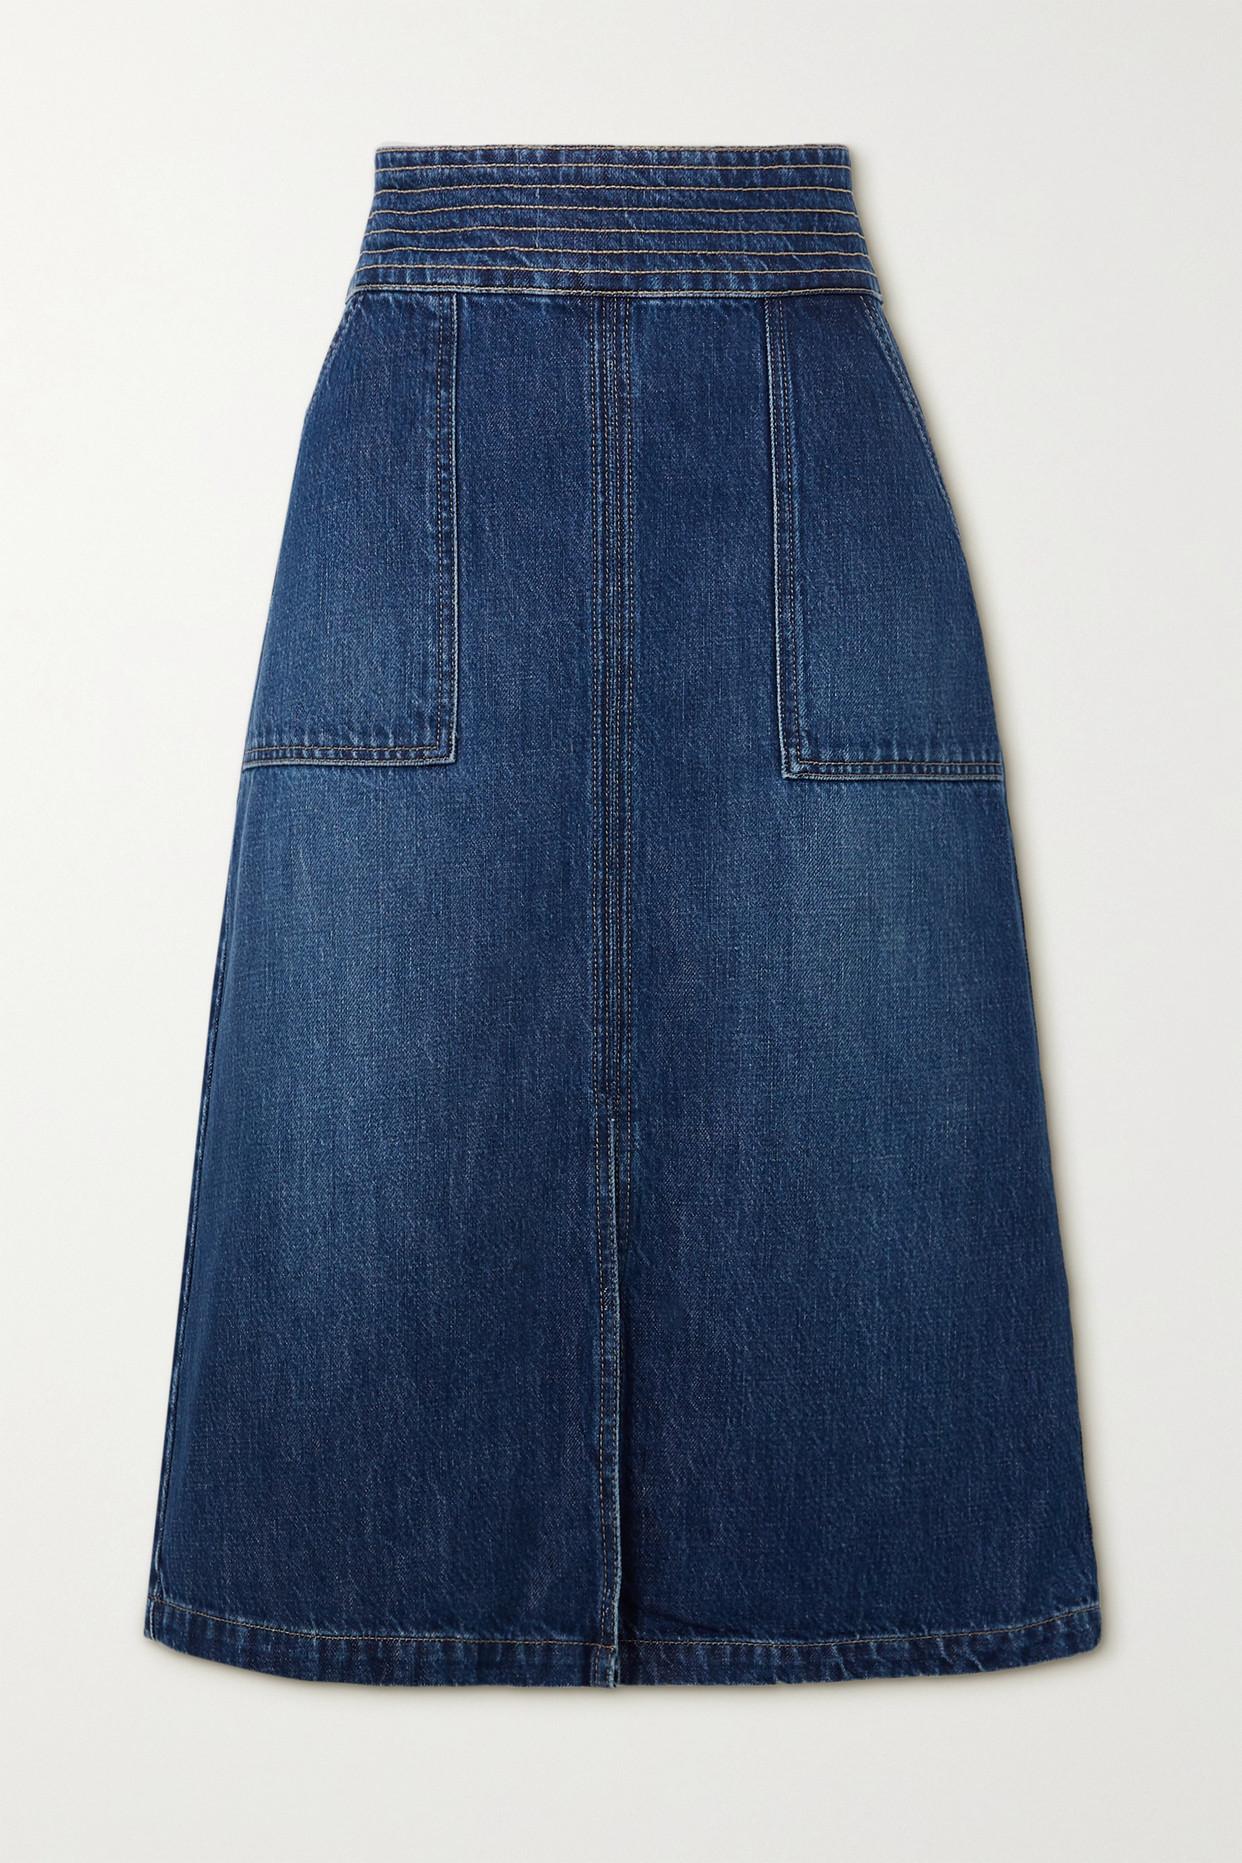 FRAME - Trapunto Denim Midi Skirt - Blue - 25